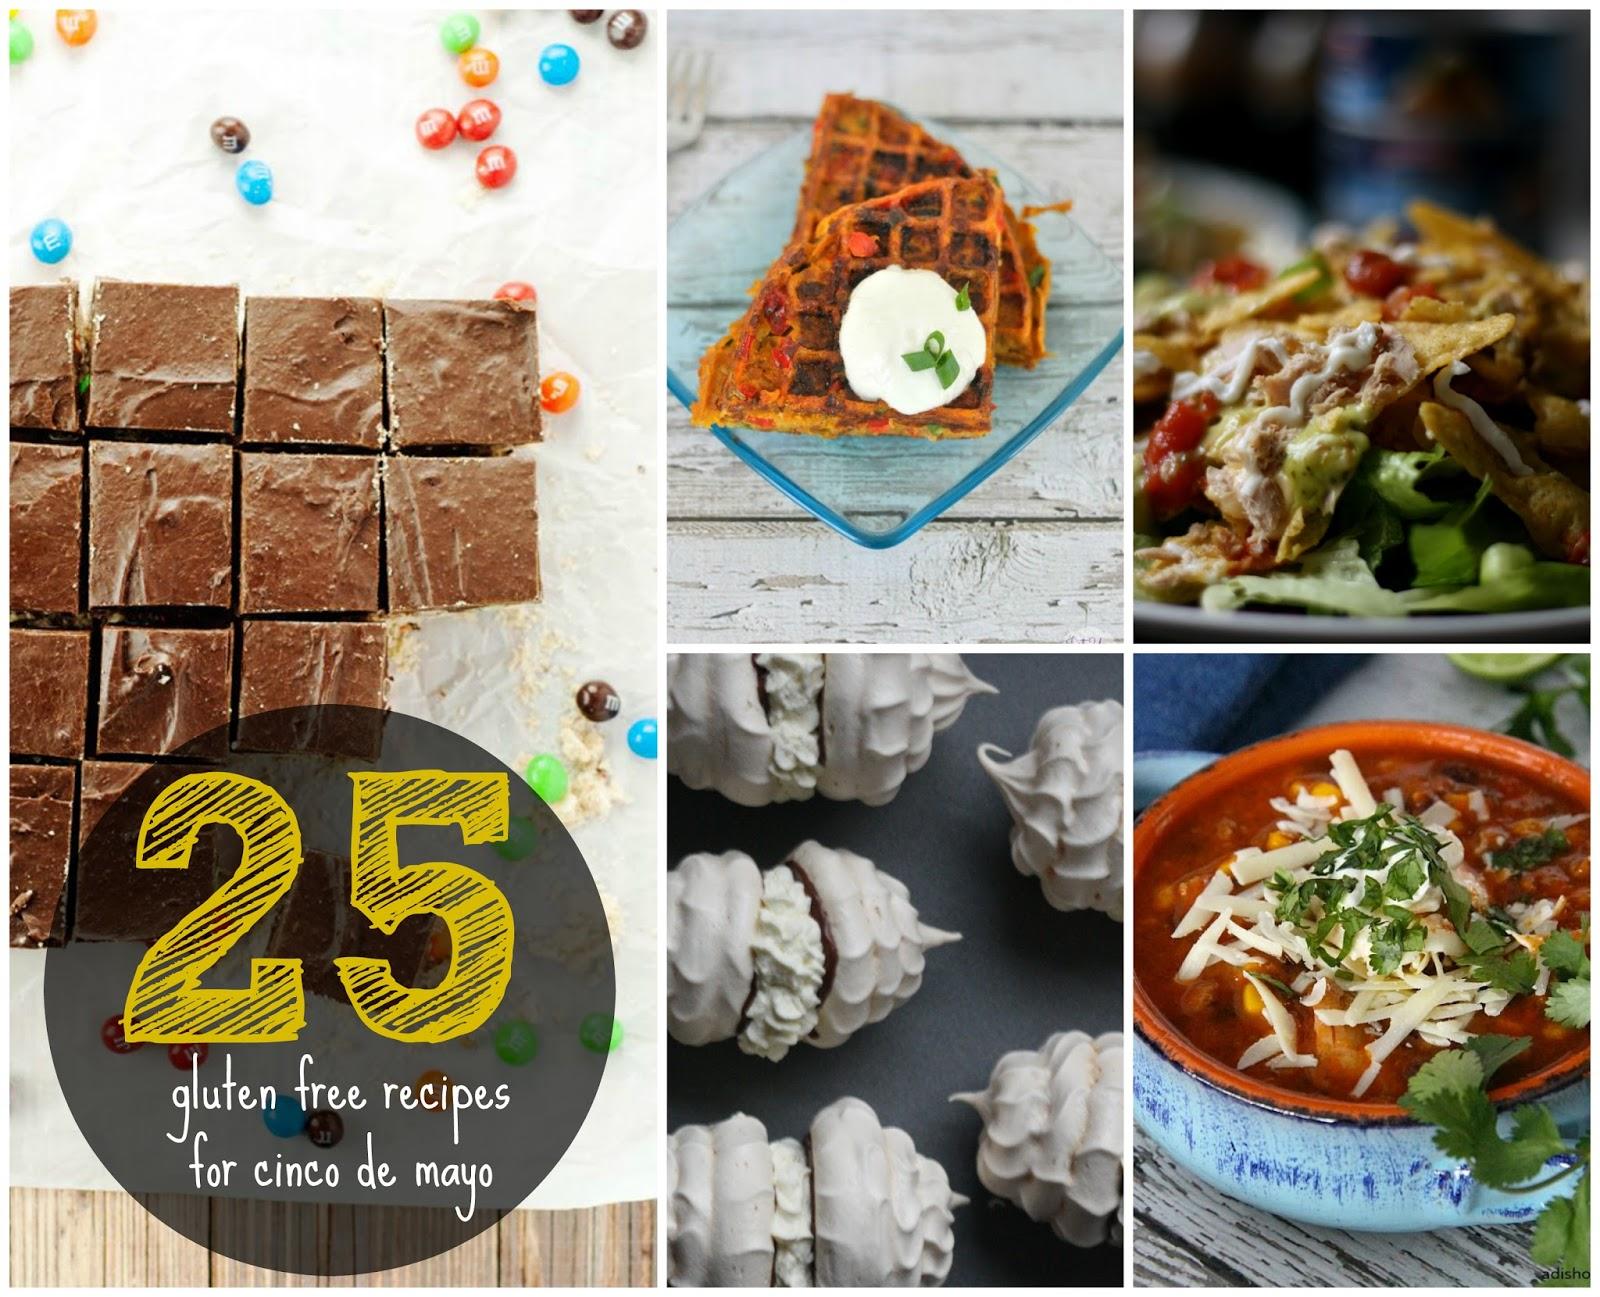 25 Gluten Free Cinco de Mayo Recipes from Anyonita-nibbles.co.uk